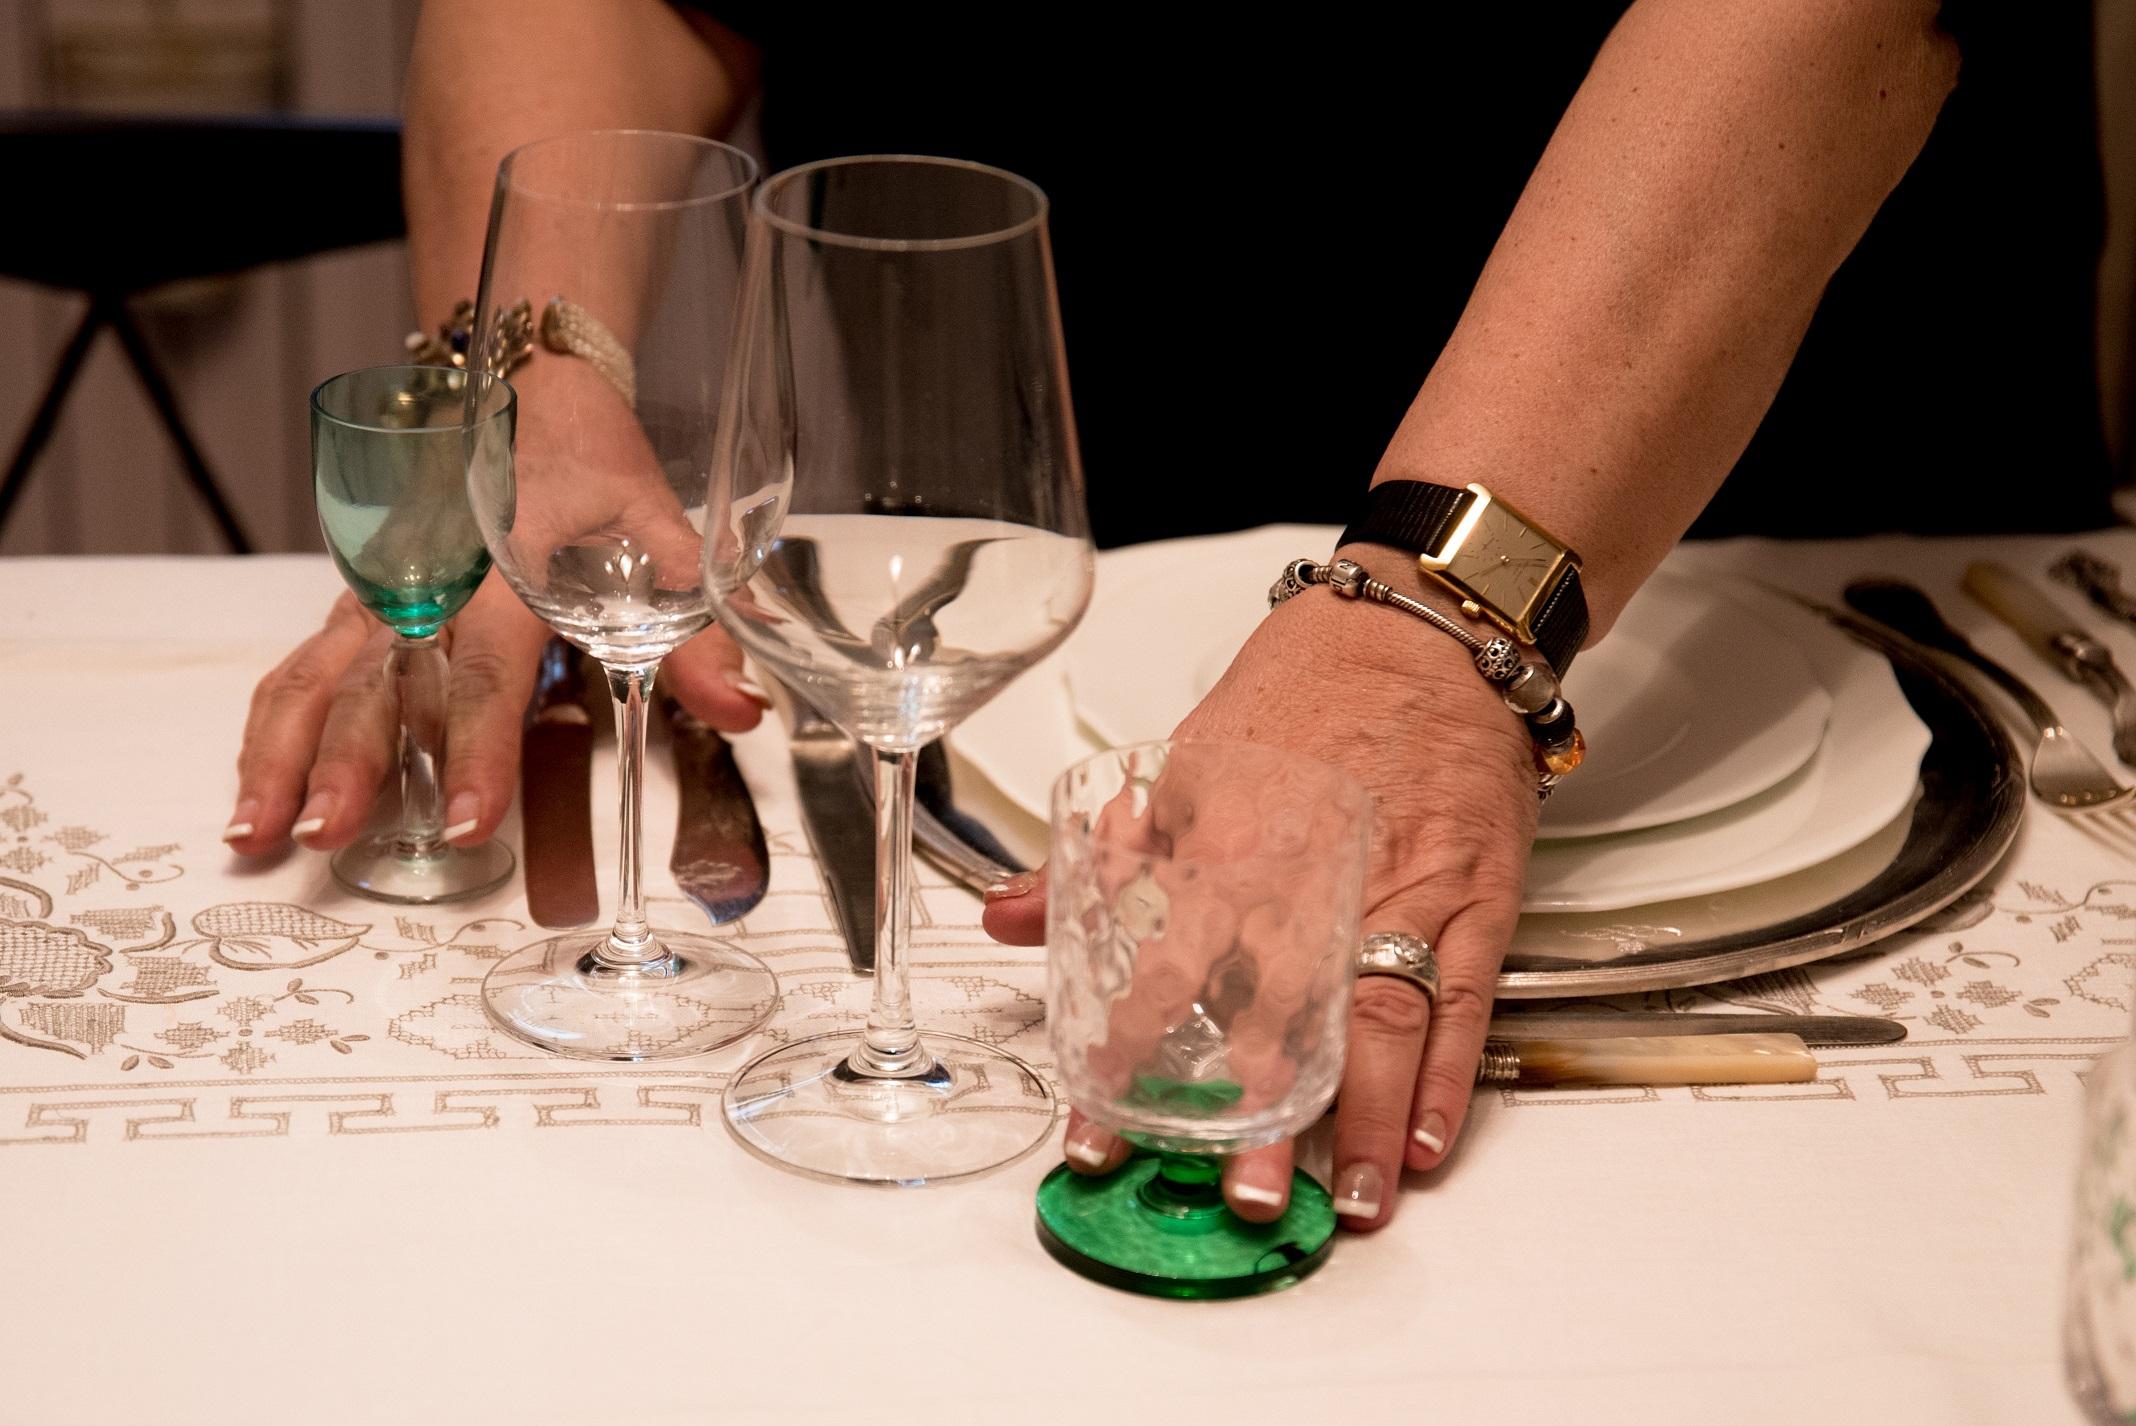 Con i bicchieri infrangete le regole